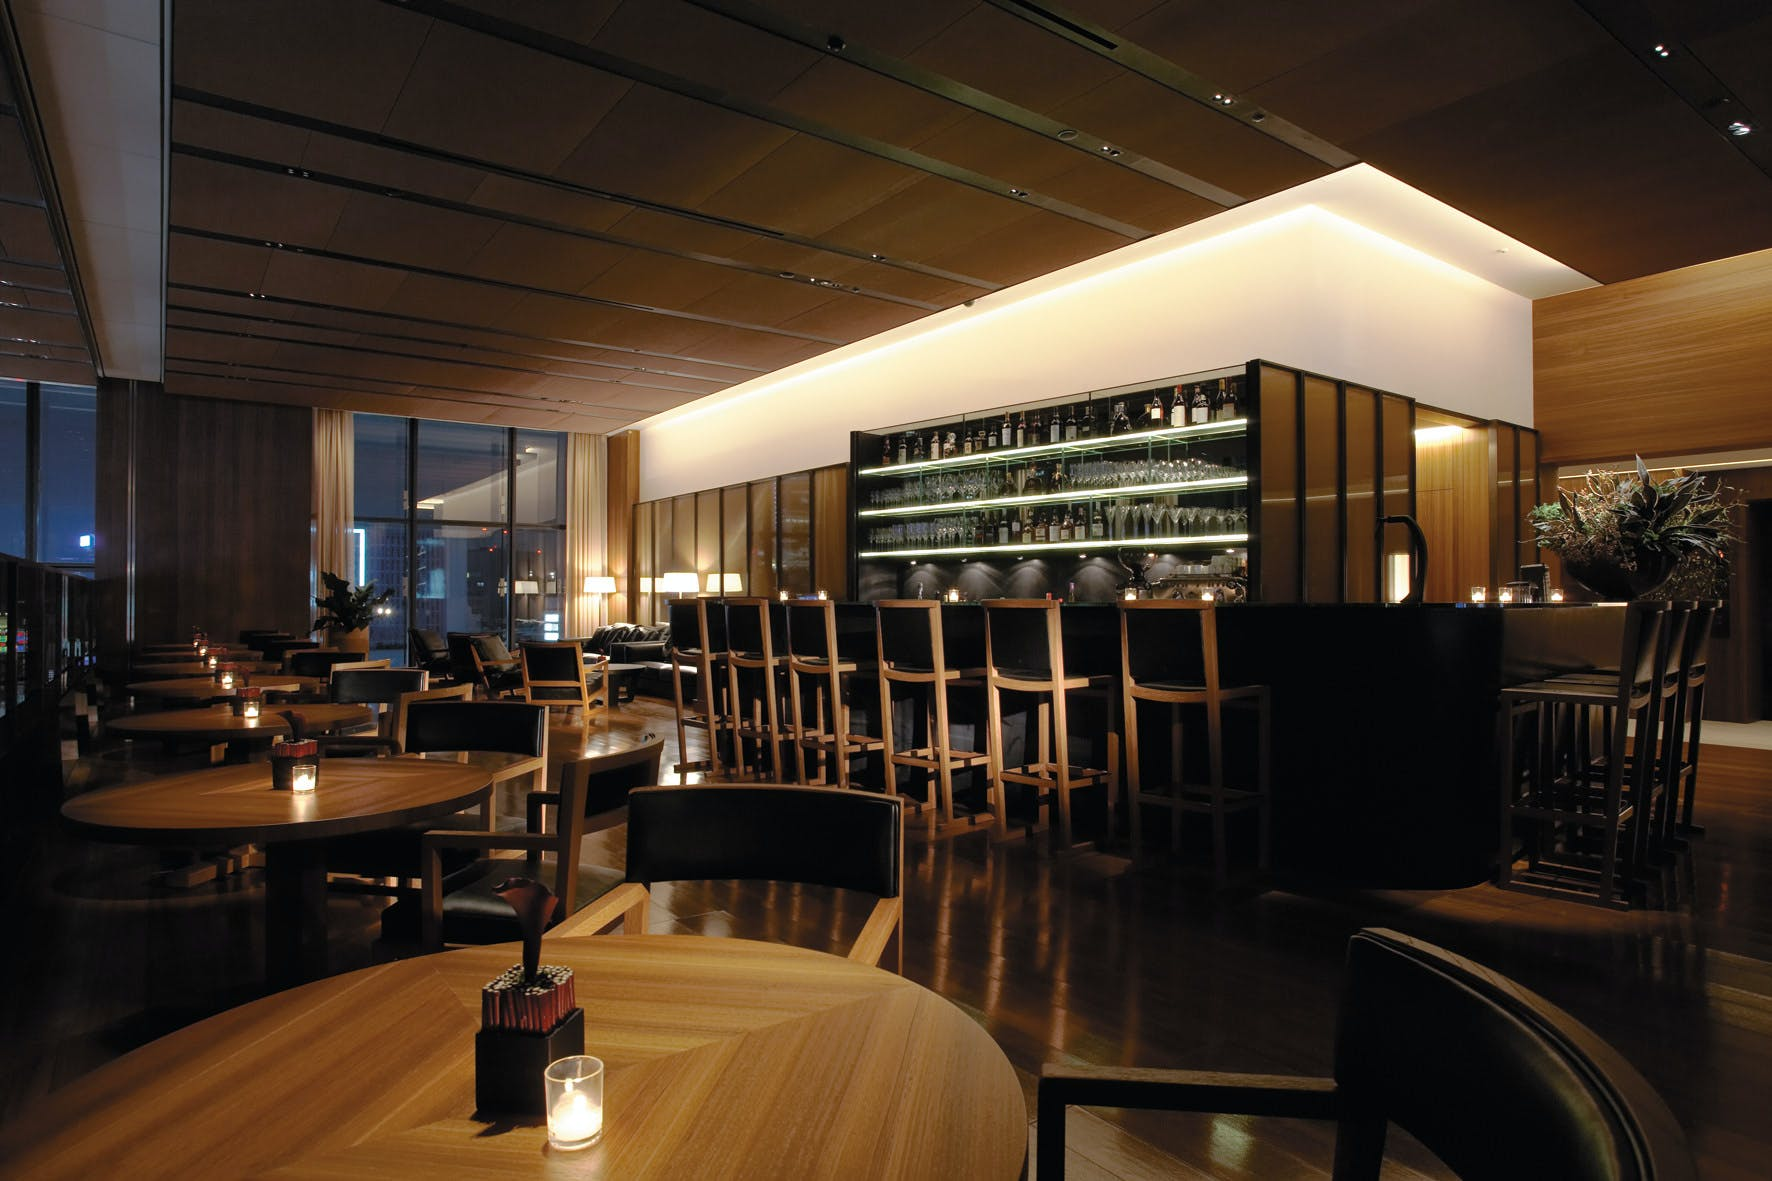 BVLGARI Il Bar